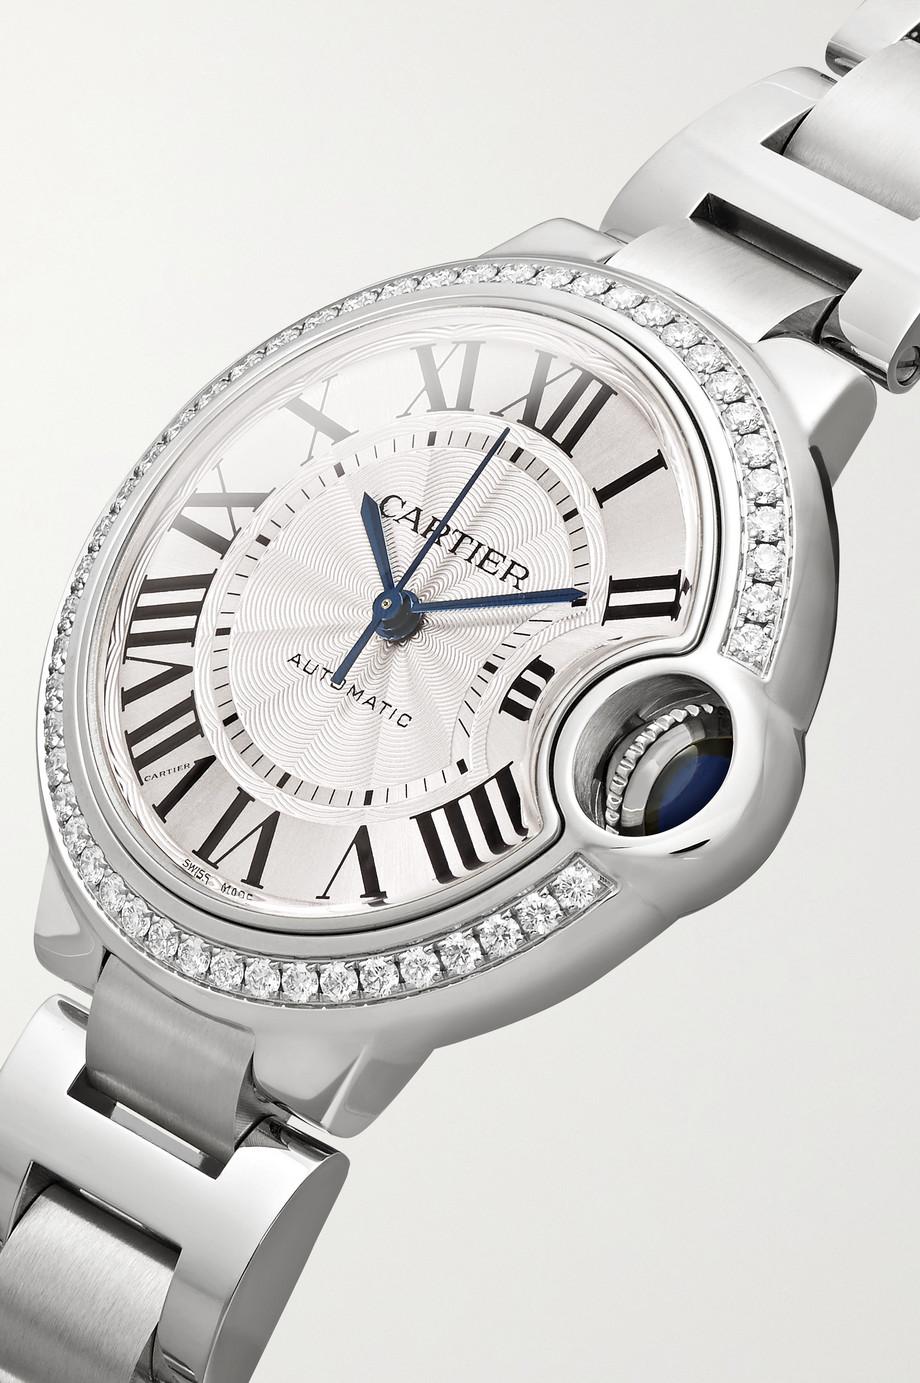 Cartier Ballon Bleu de Cartier Automatic 36 mm Uhr aus Edelstahl mit Diamanten